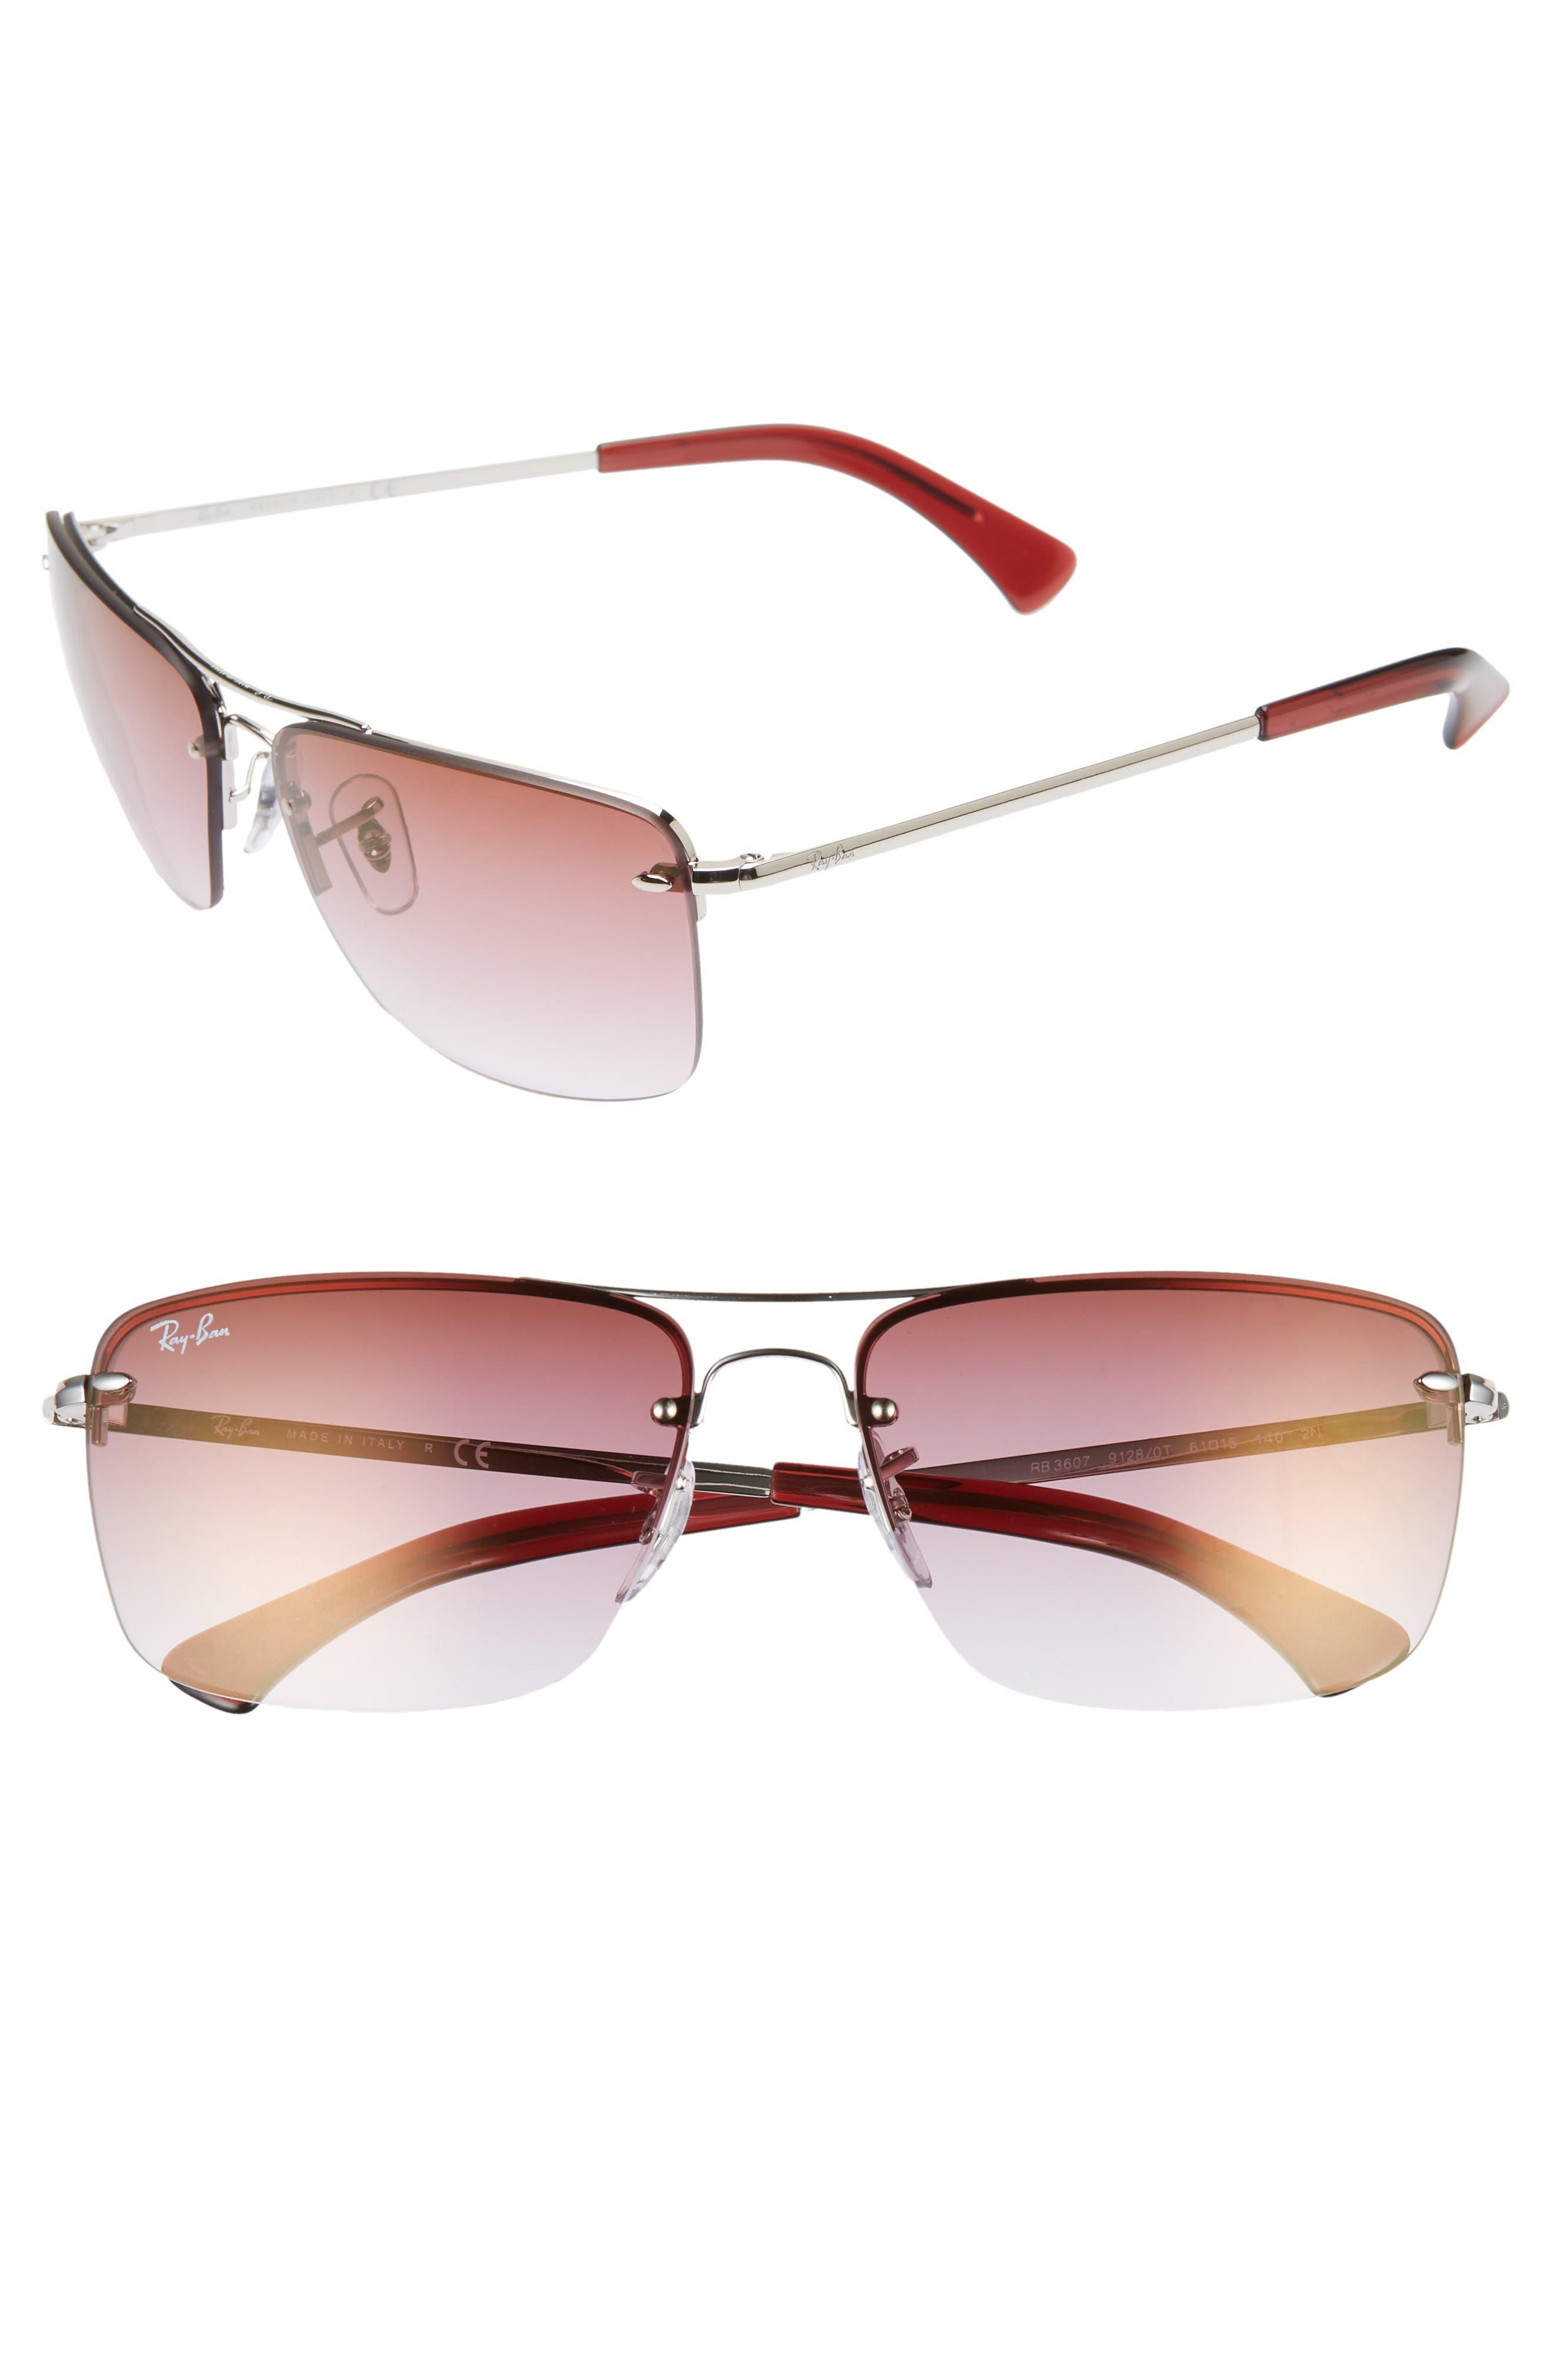 Ray-Ban 61Mm Rimless Navigator Sunglasses - Silver/ Bordeaux Gradient